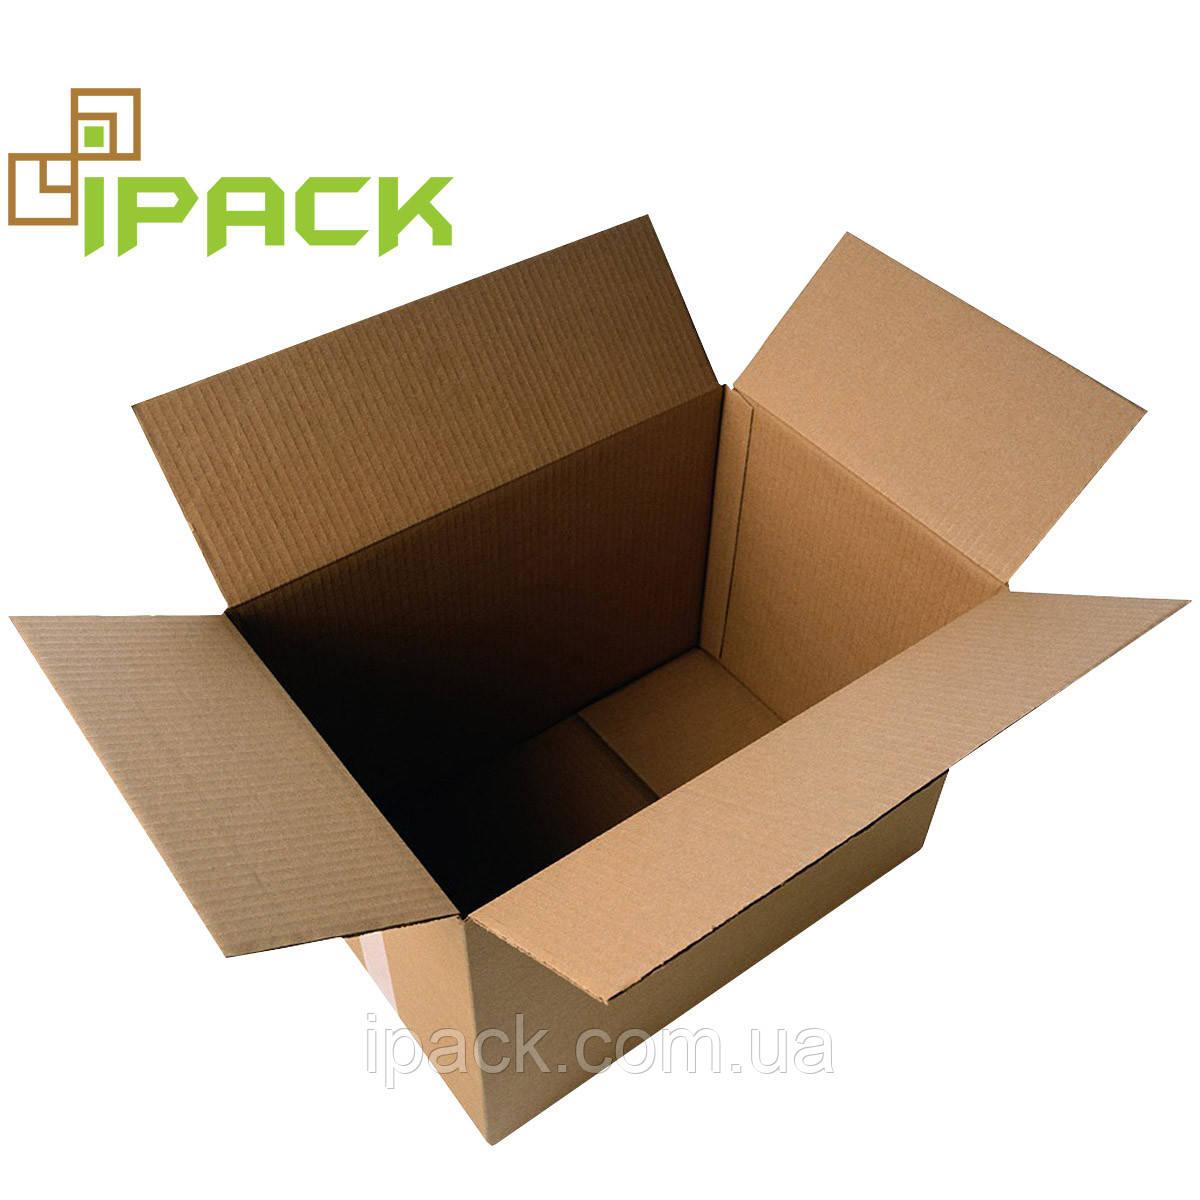 Гофроящик 310*160*290 мм бурий четырехклапанный картонний короб